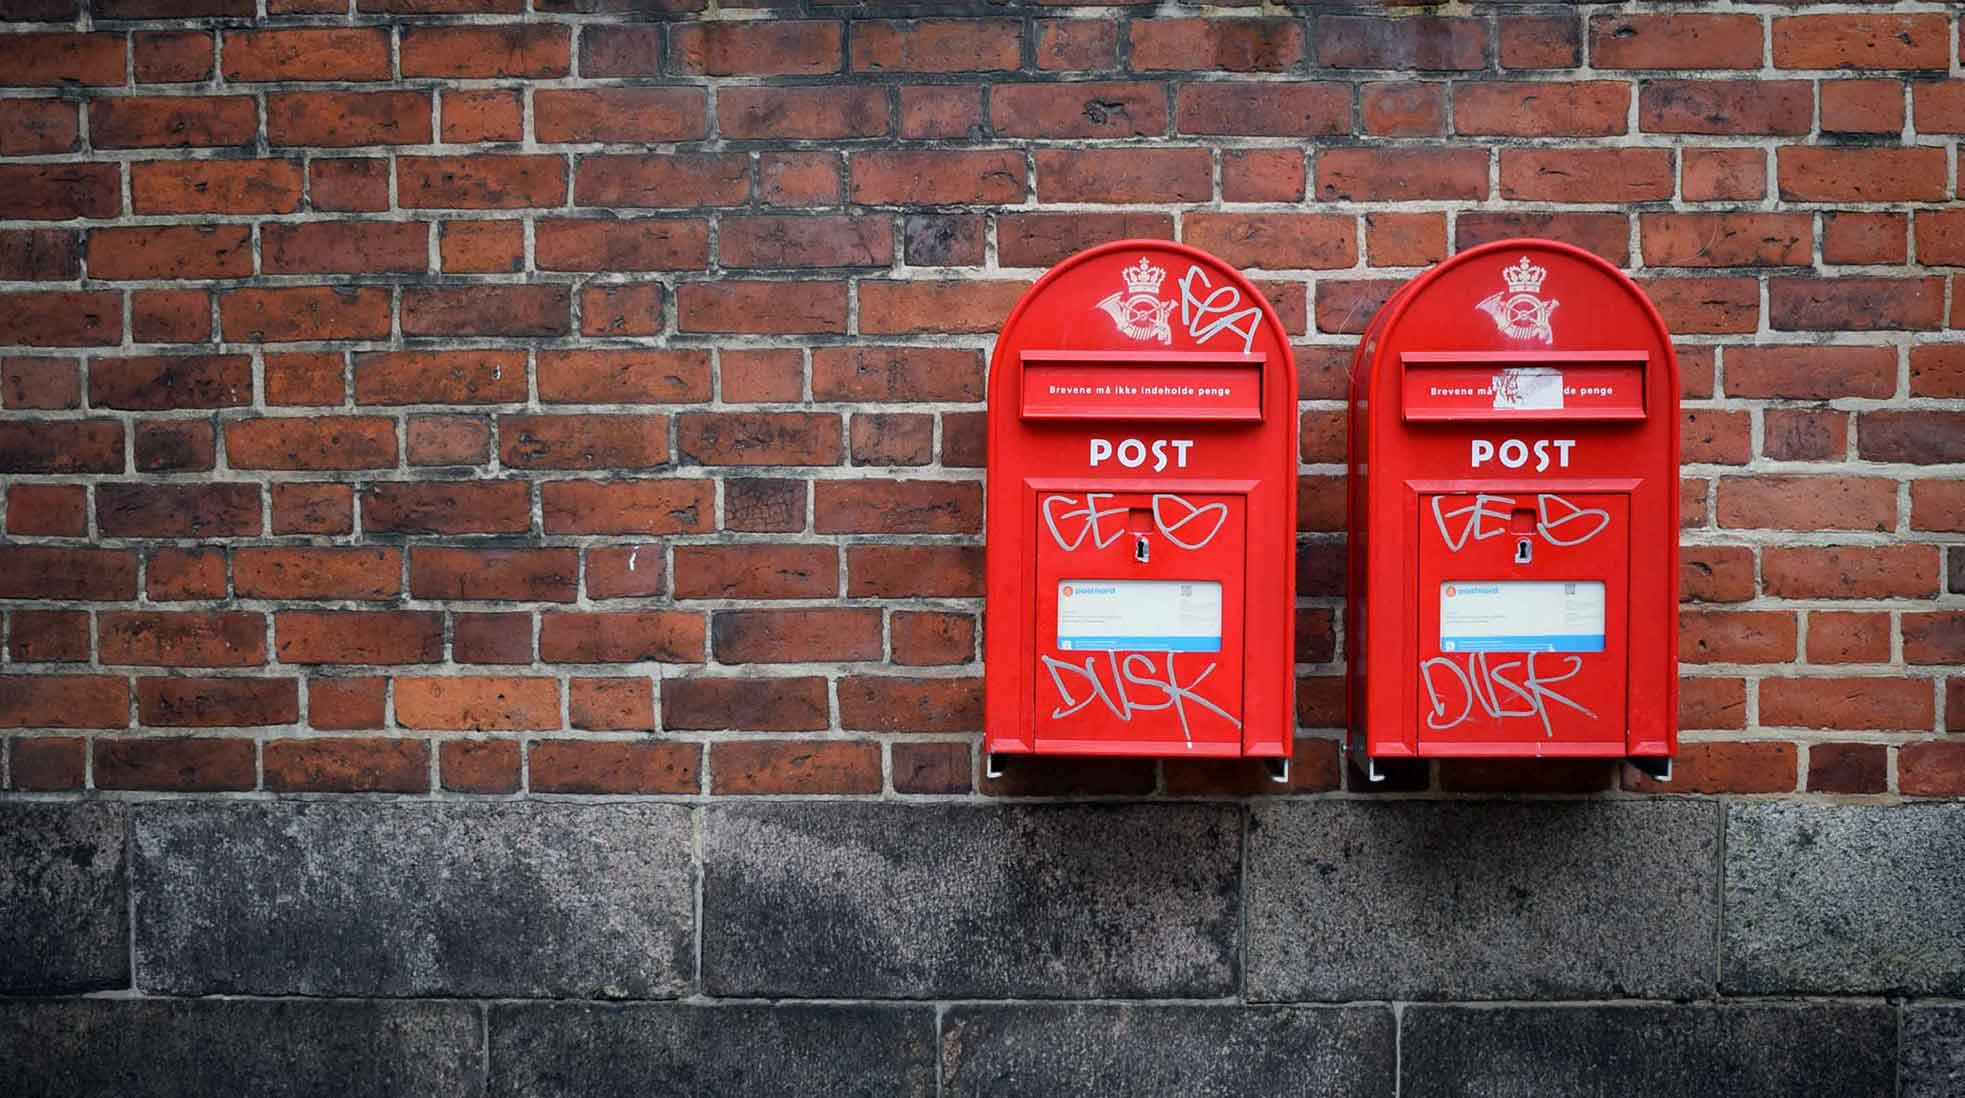 Mailboxes. Photo: Kristina Tripkovic / Unsplash